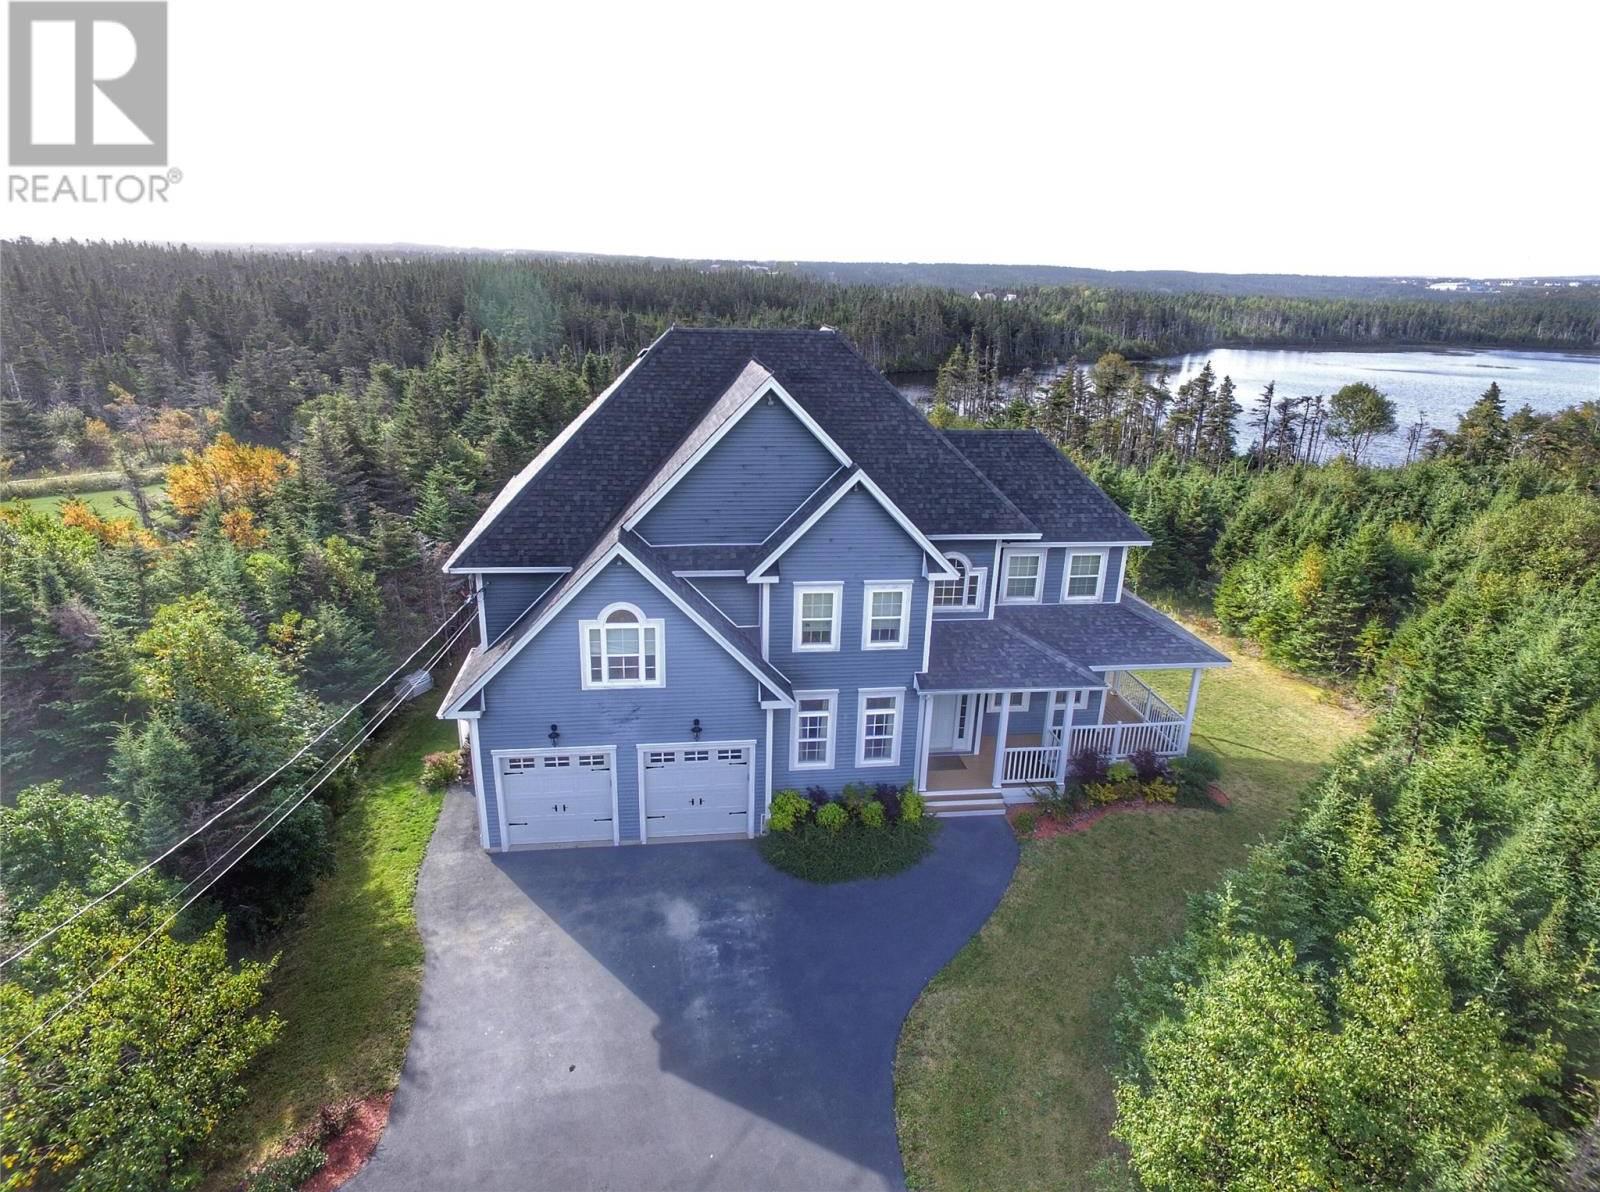 House for sale at 9 Sallesnik Ln Torbay Newfoundland - MLS: 1185207